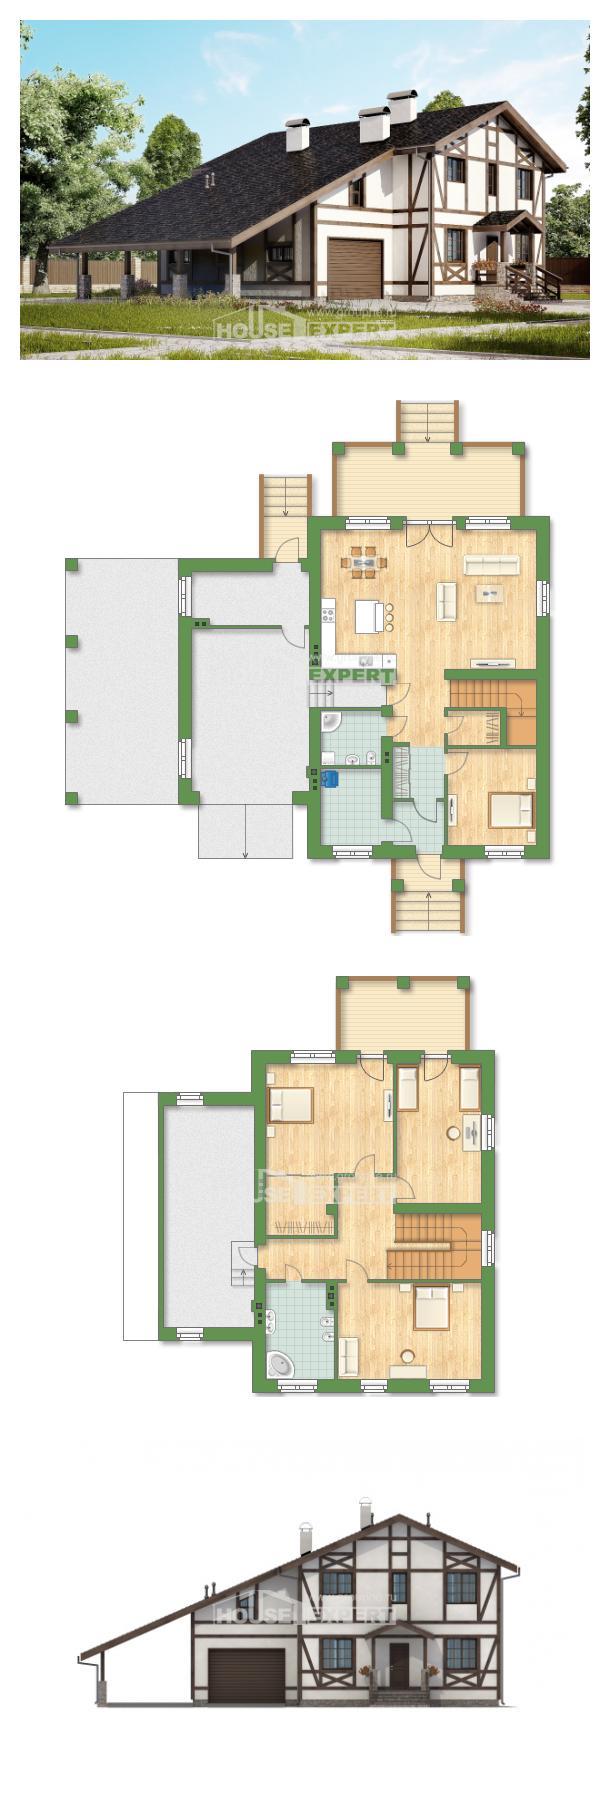 Ev villa projesi 250-002-L | House Expert